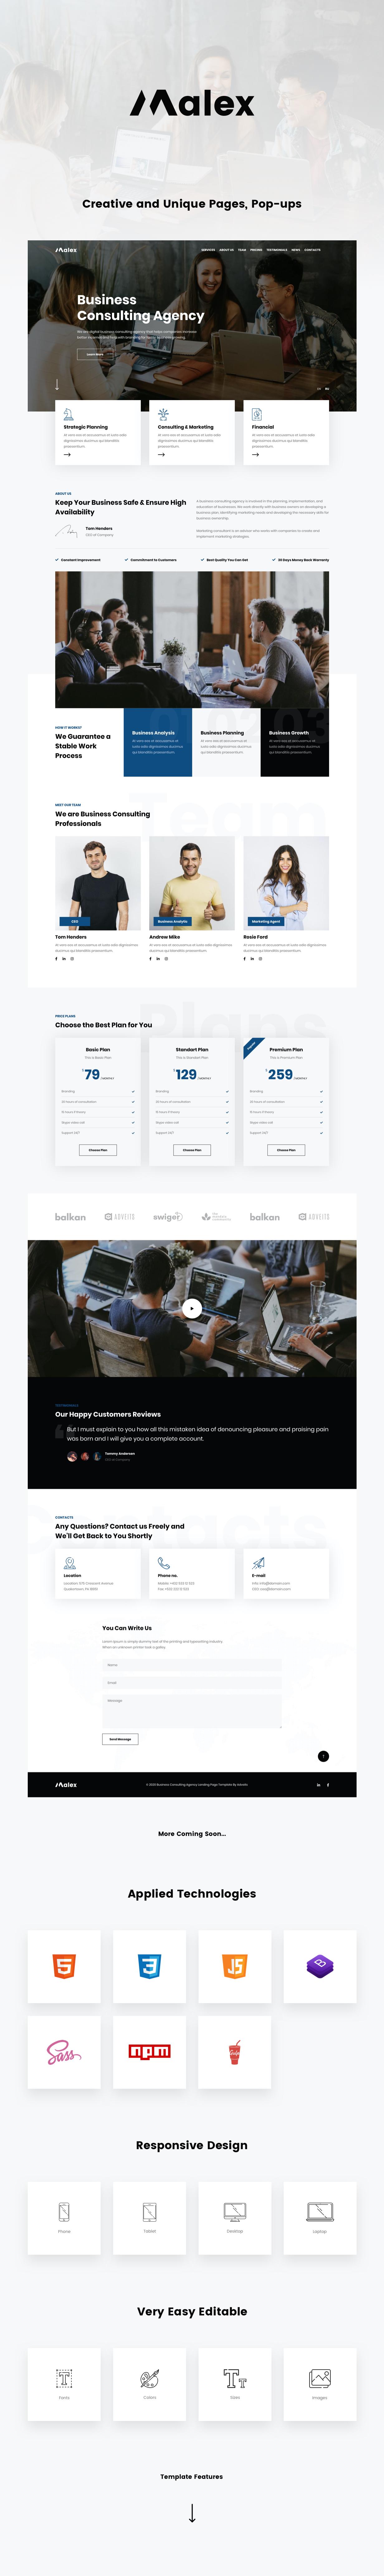 Malex Landing Page Presentation